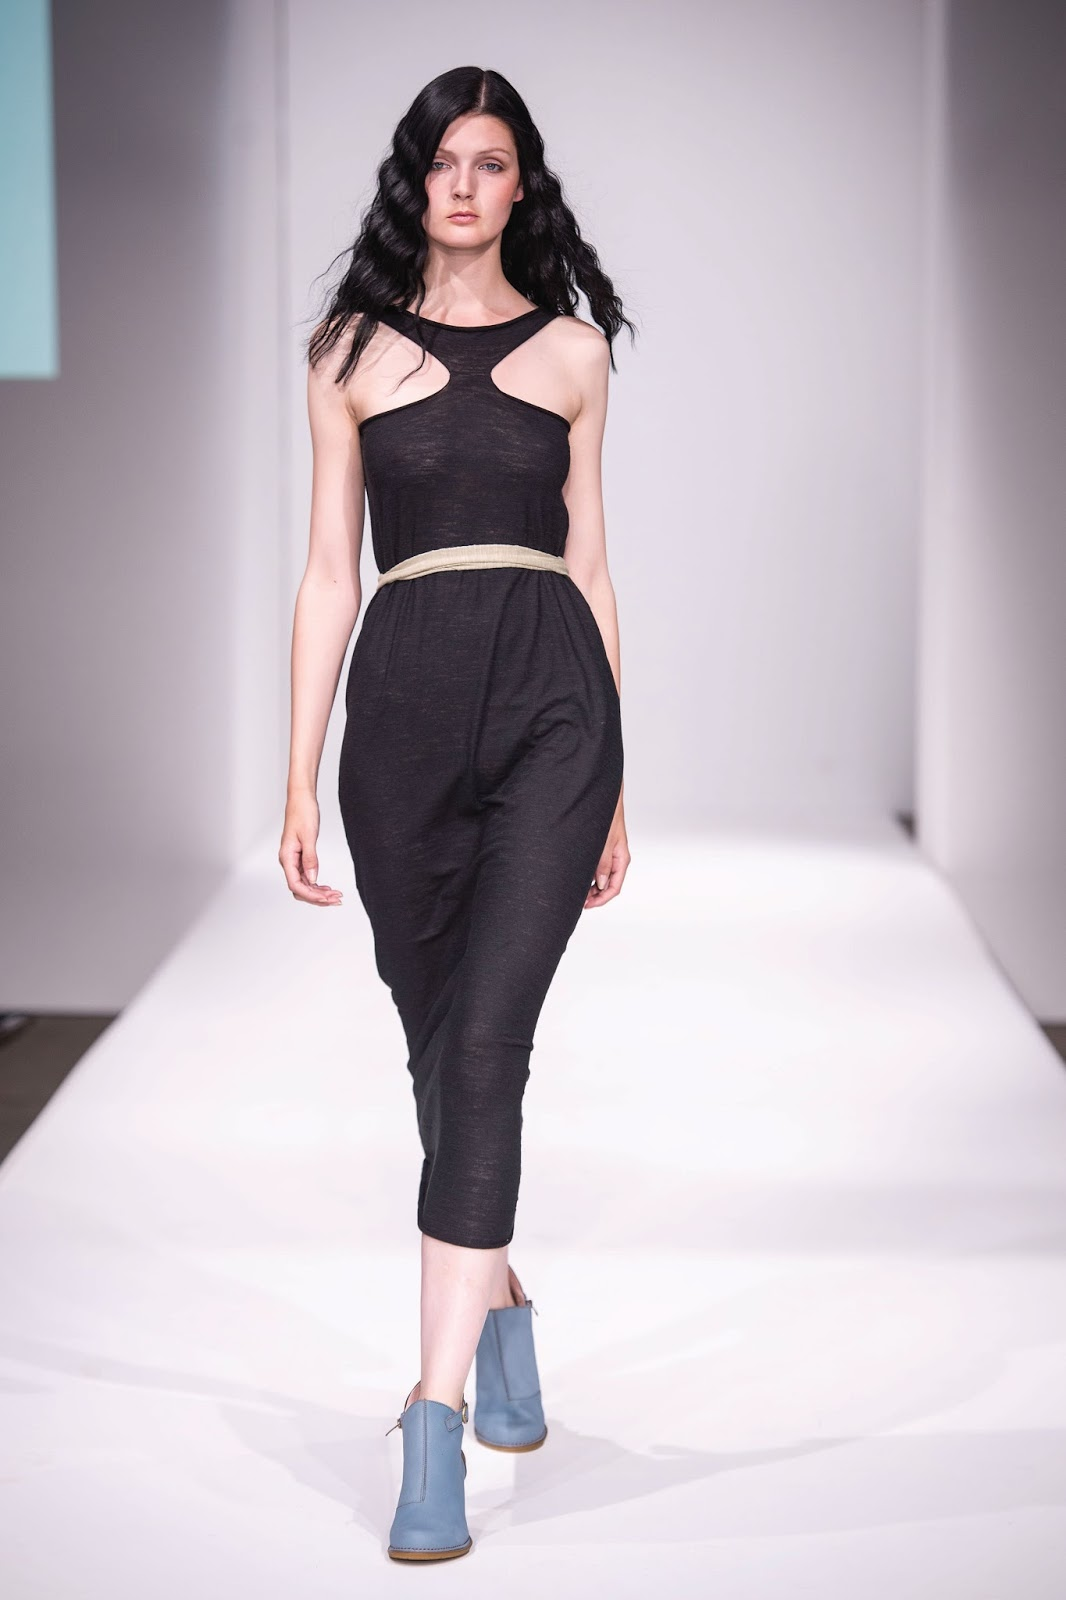 fashion studio magazine fashion events germany. Black Bedroom Furniture Sets. Home Design Ideas